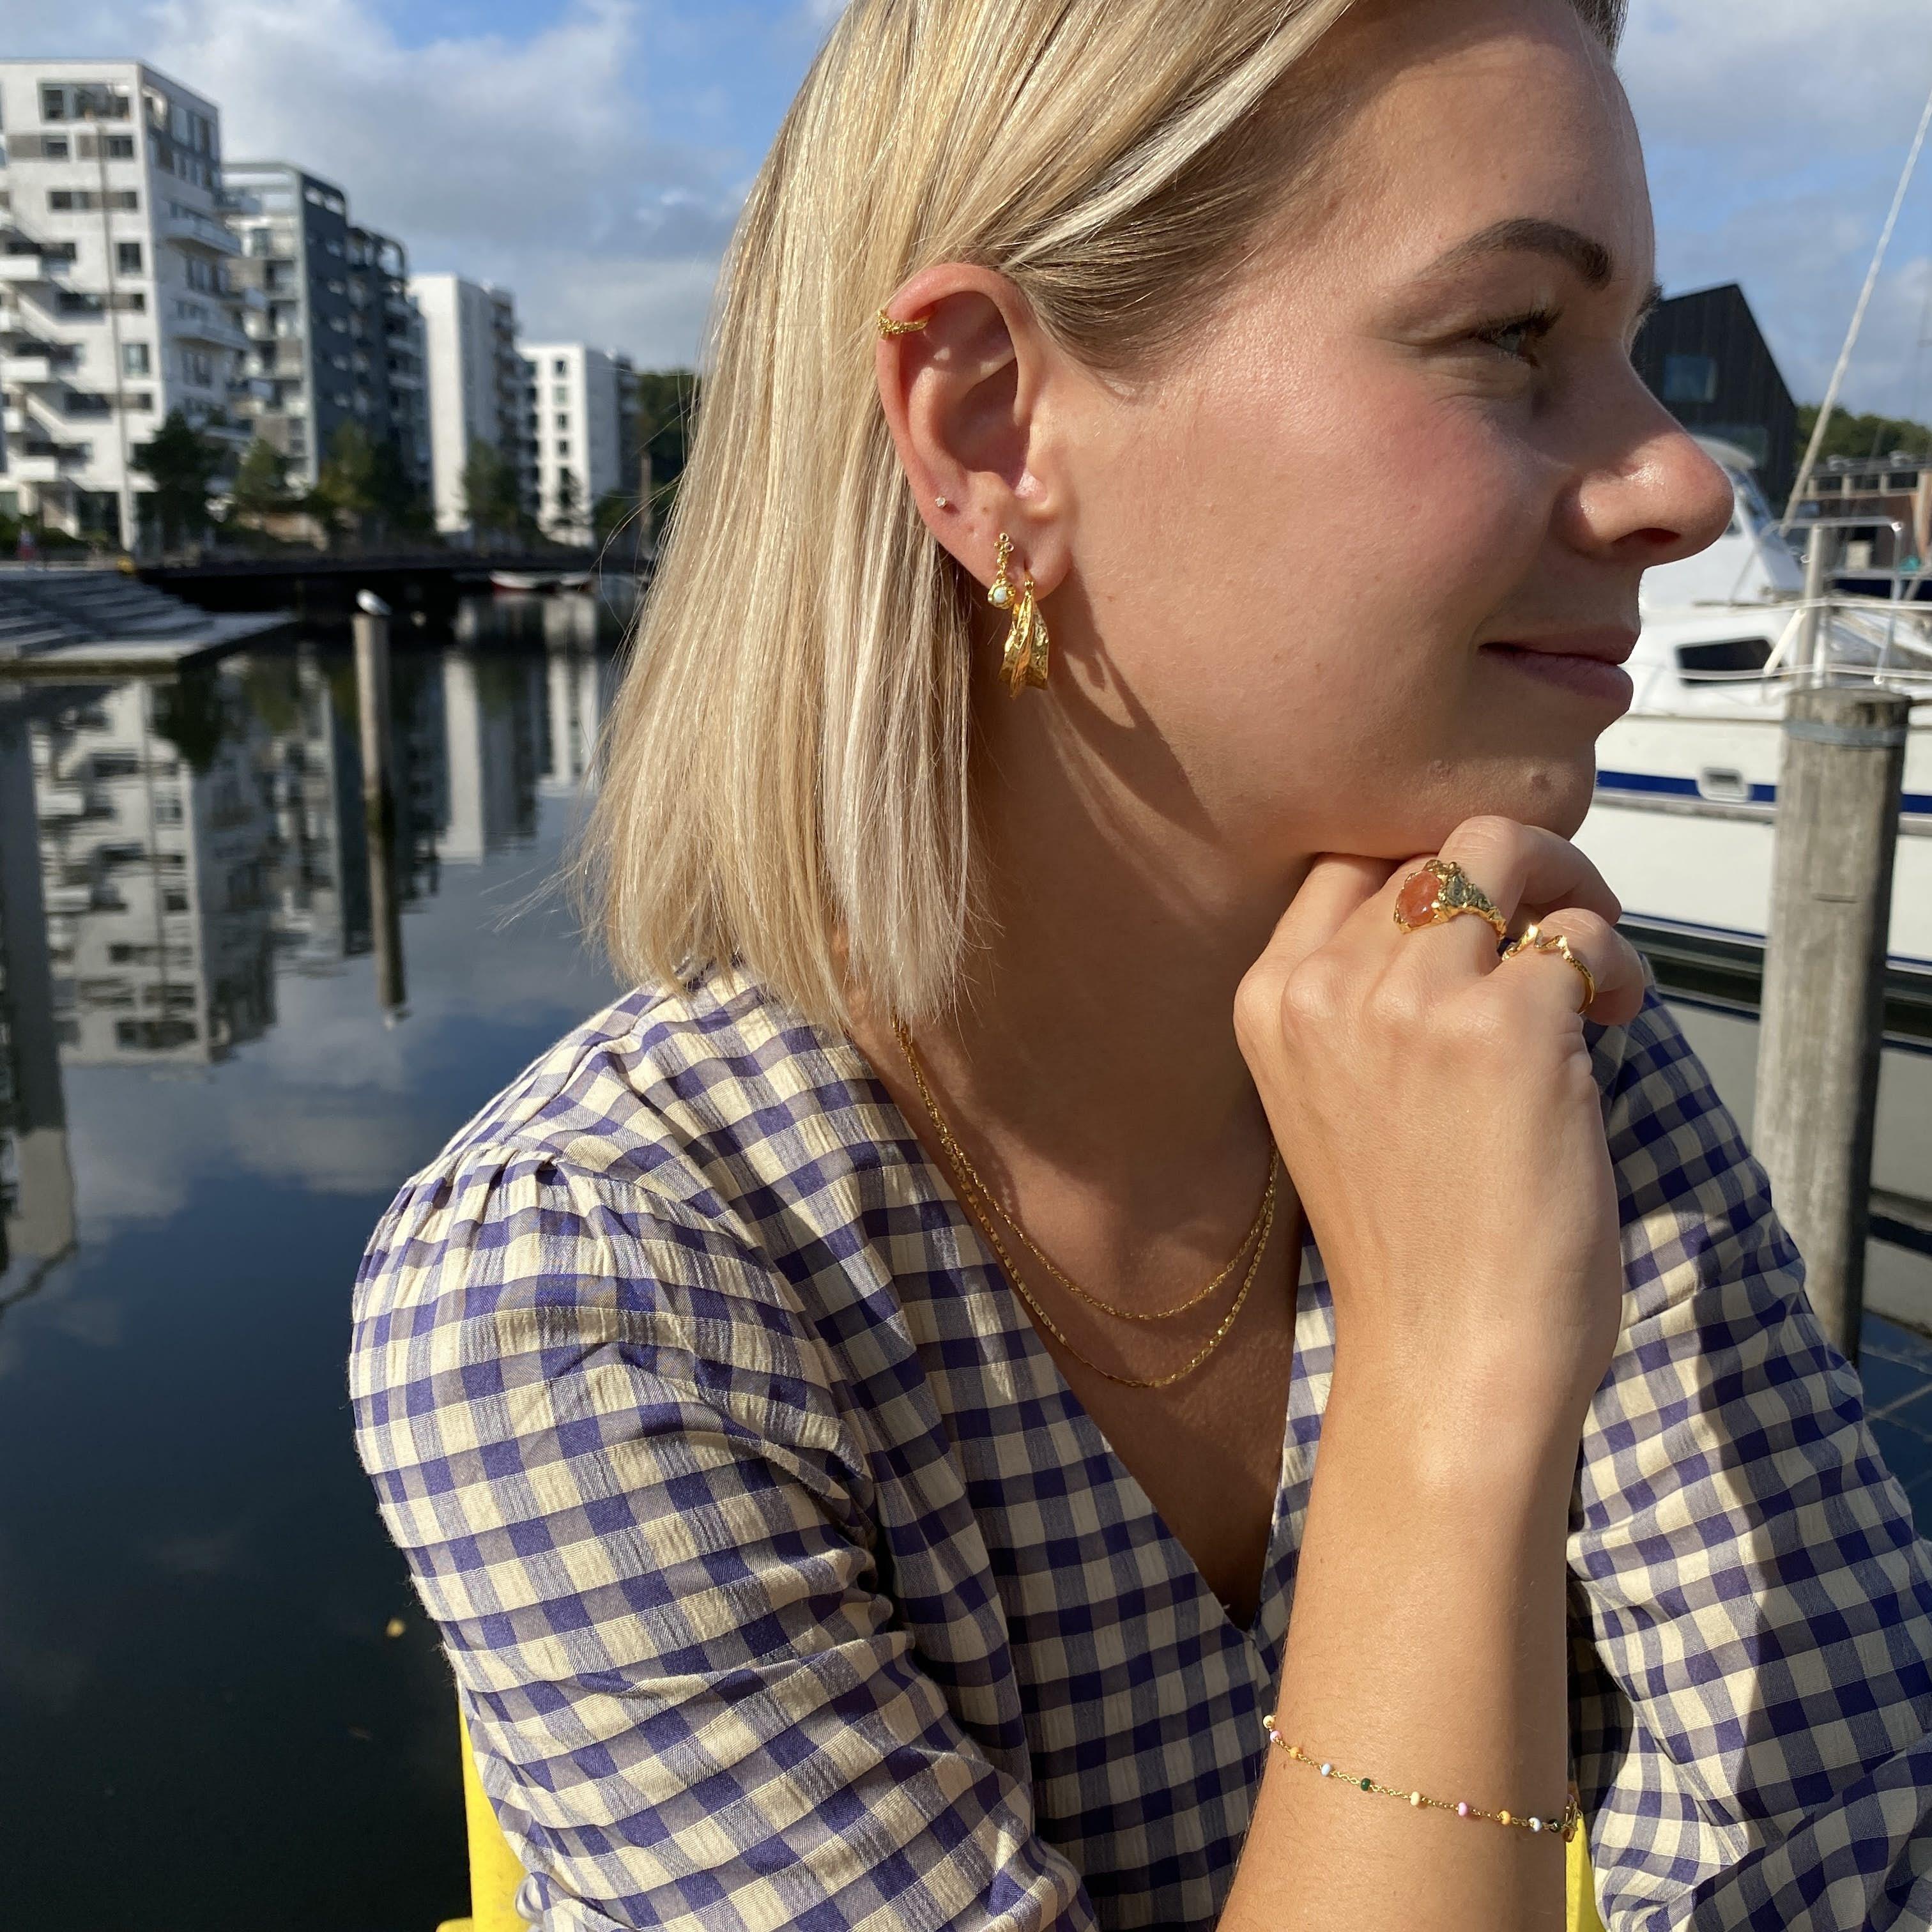 Taya earrings von Maanesten in Silber Sterling 925